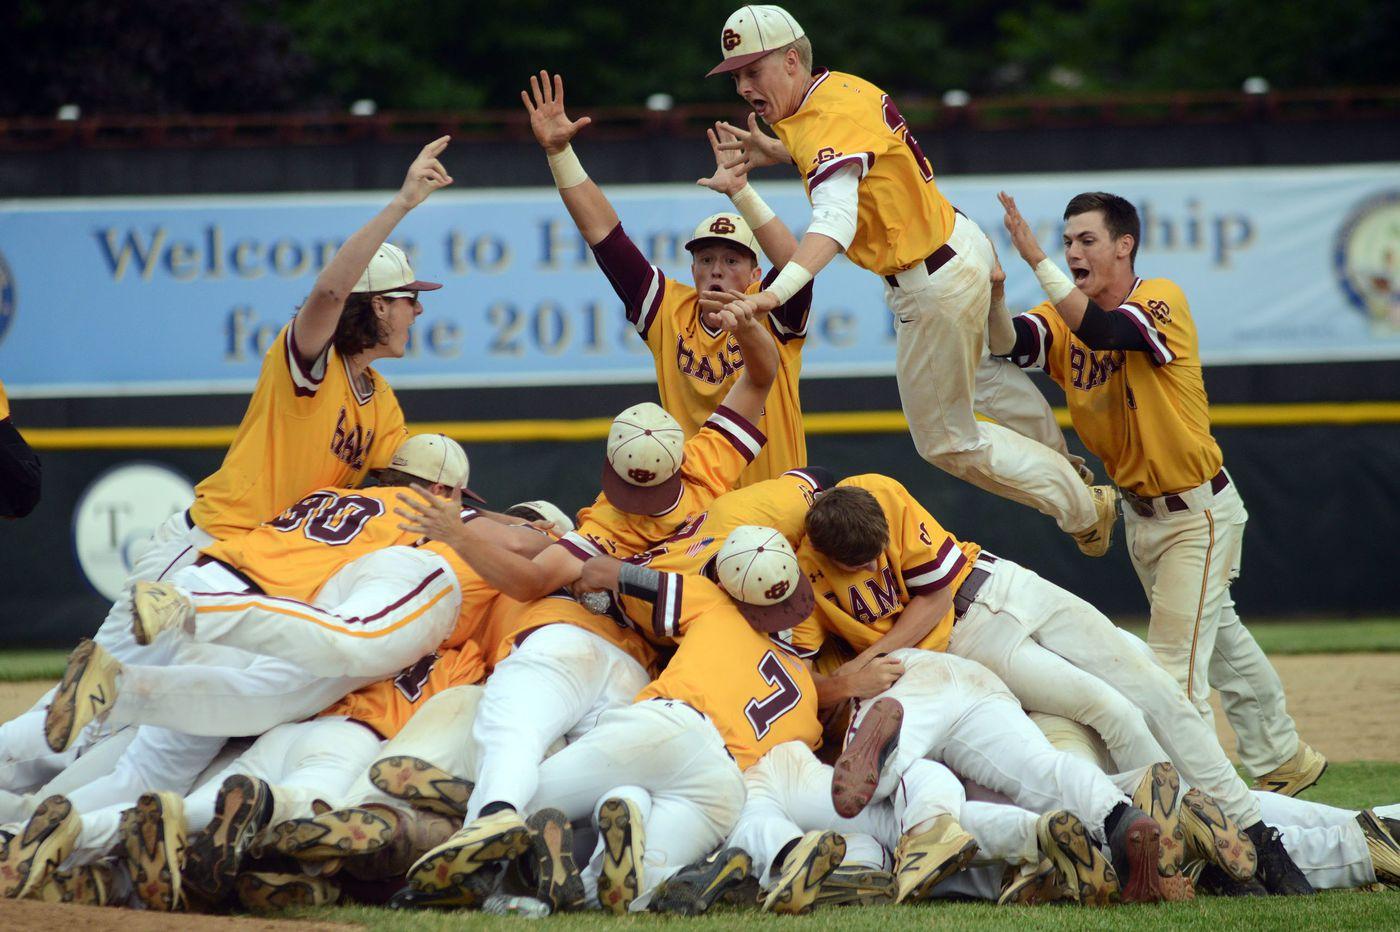 Gloucester Catholic wins second straight state baseball title